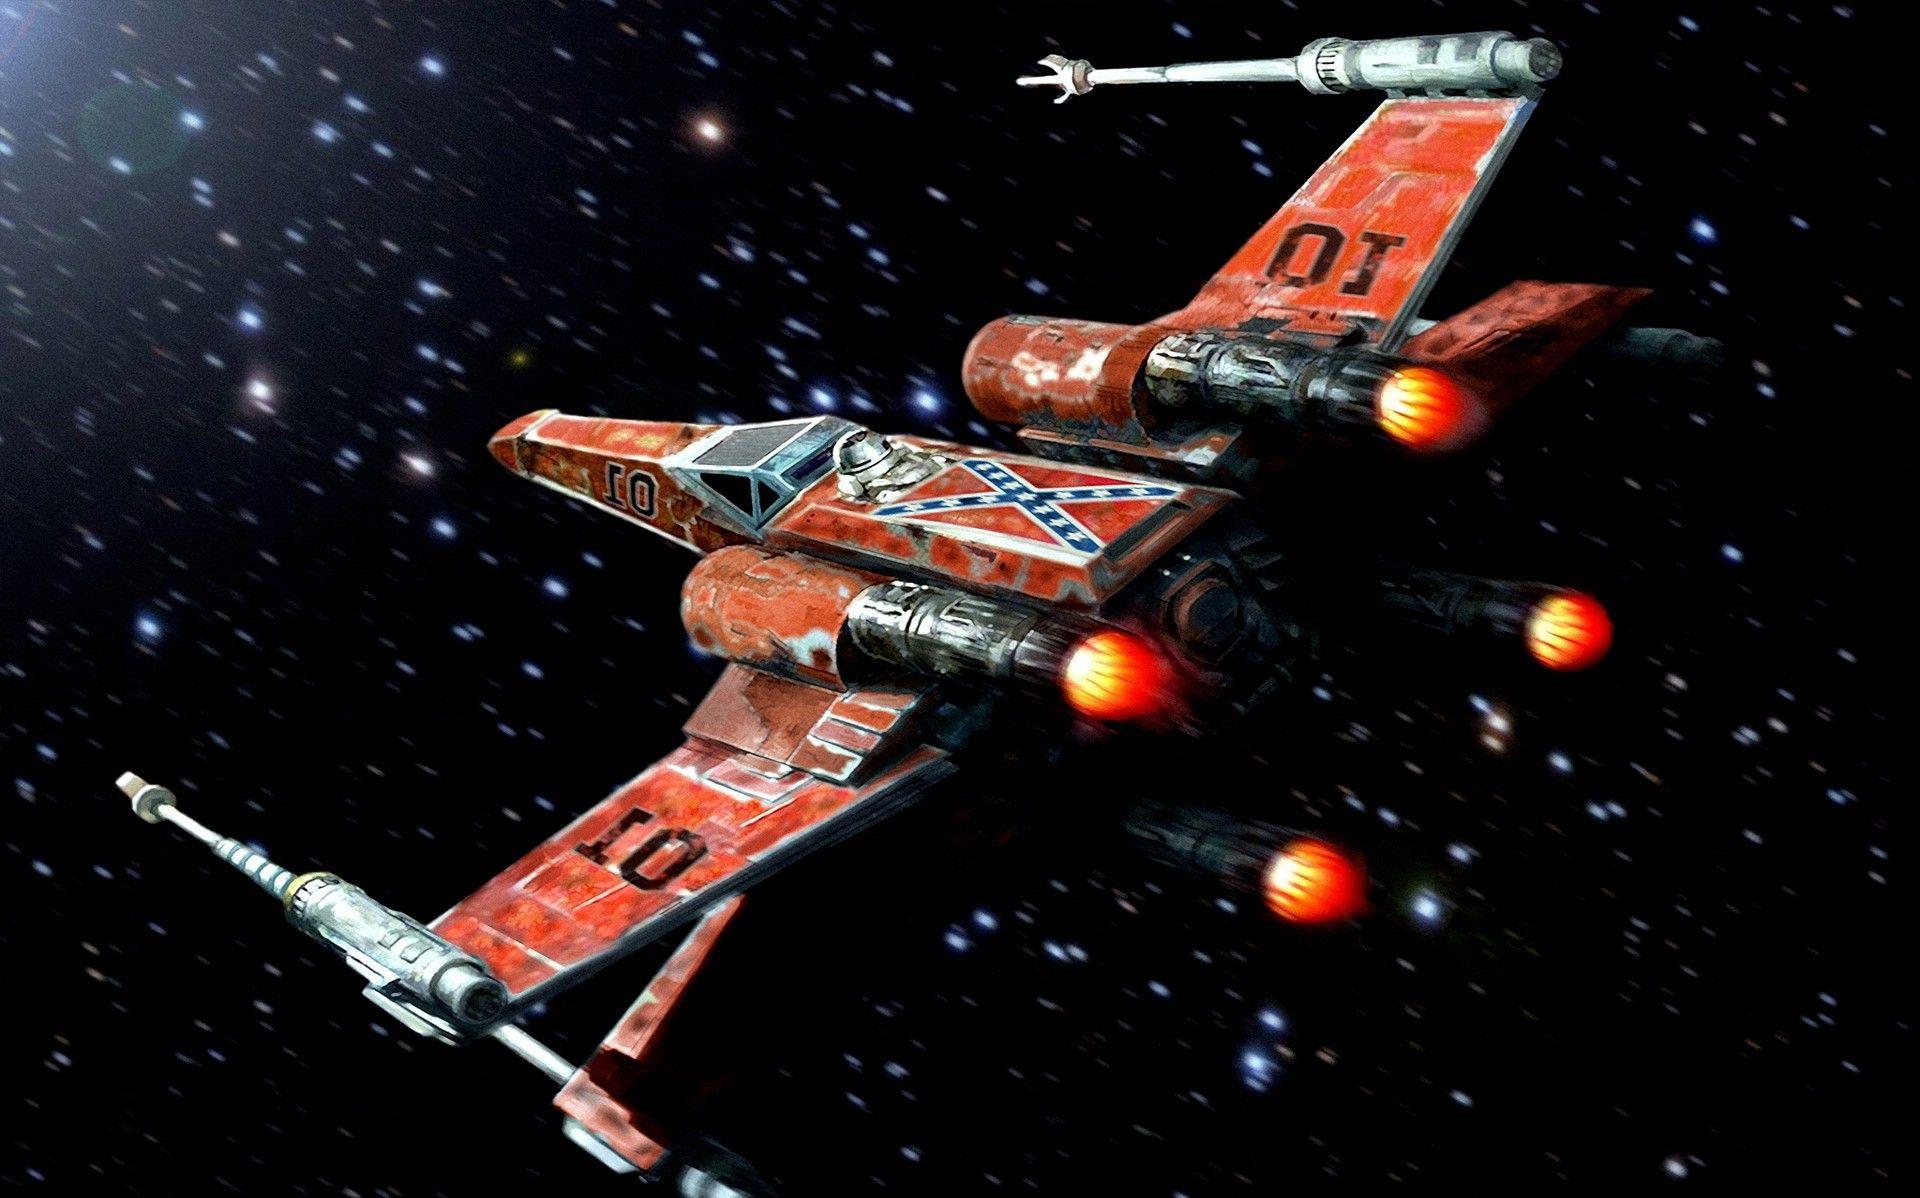 Starwars Wallpaper Cellphone: Star Wars, X Wing, Minimalism Wallpapers HD / Desktop And